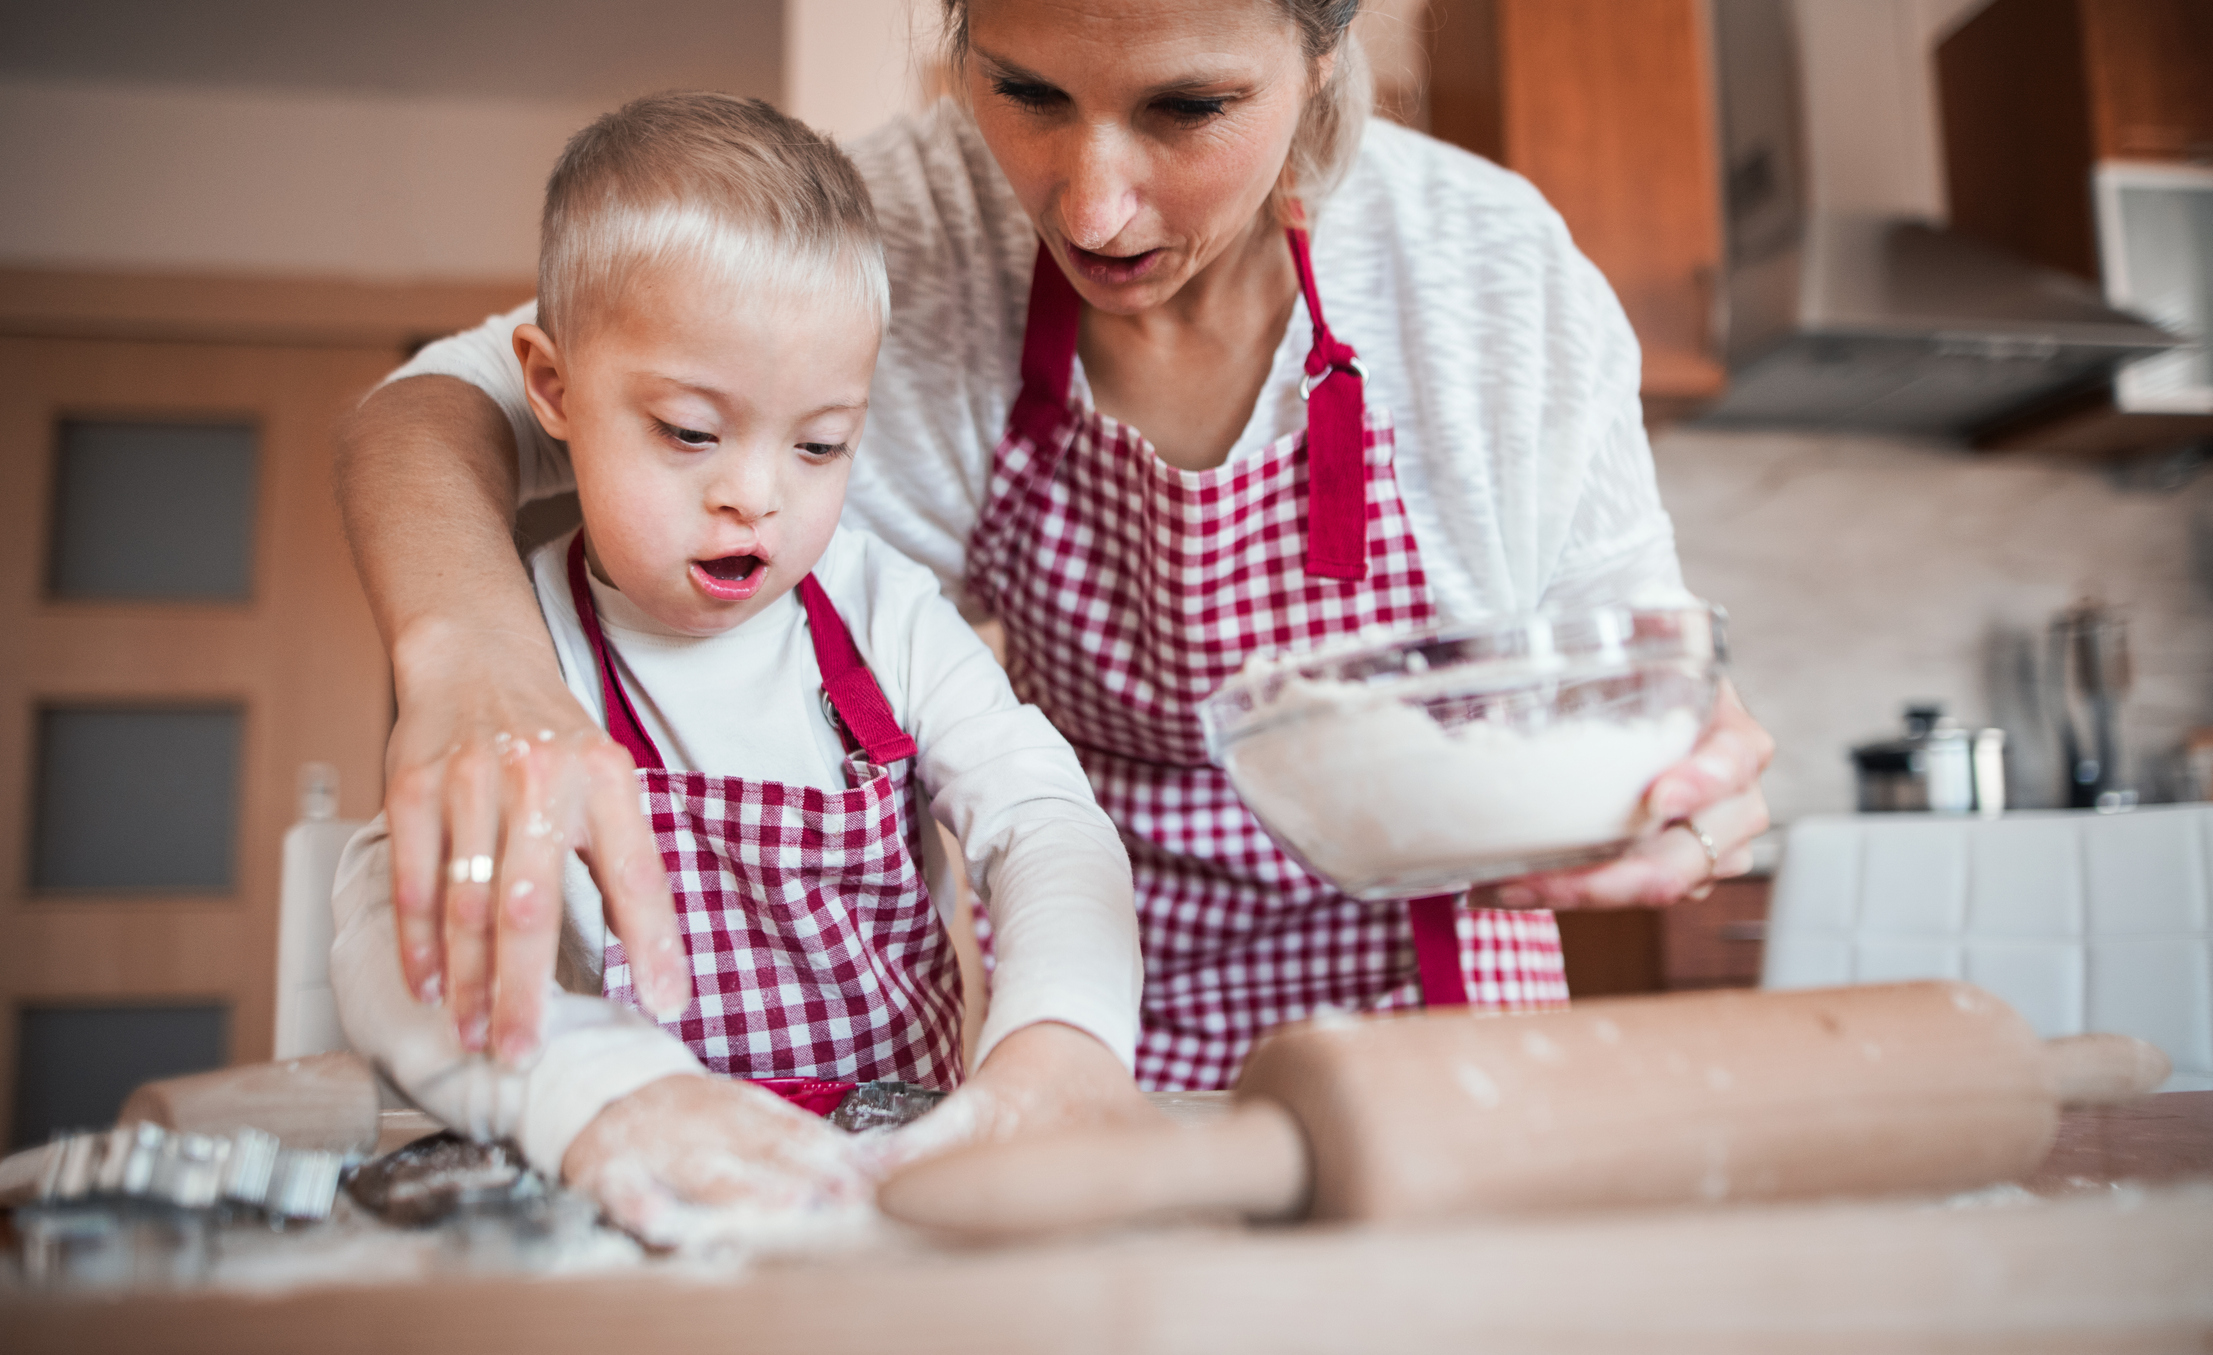 Boy cooking.jpg